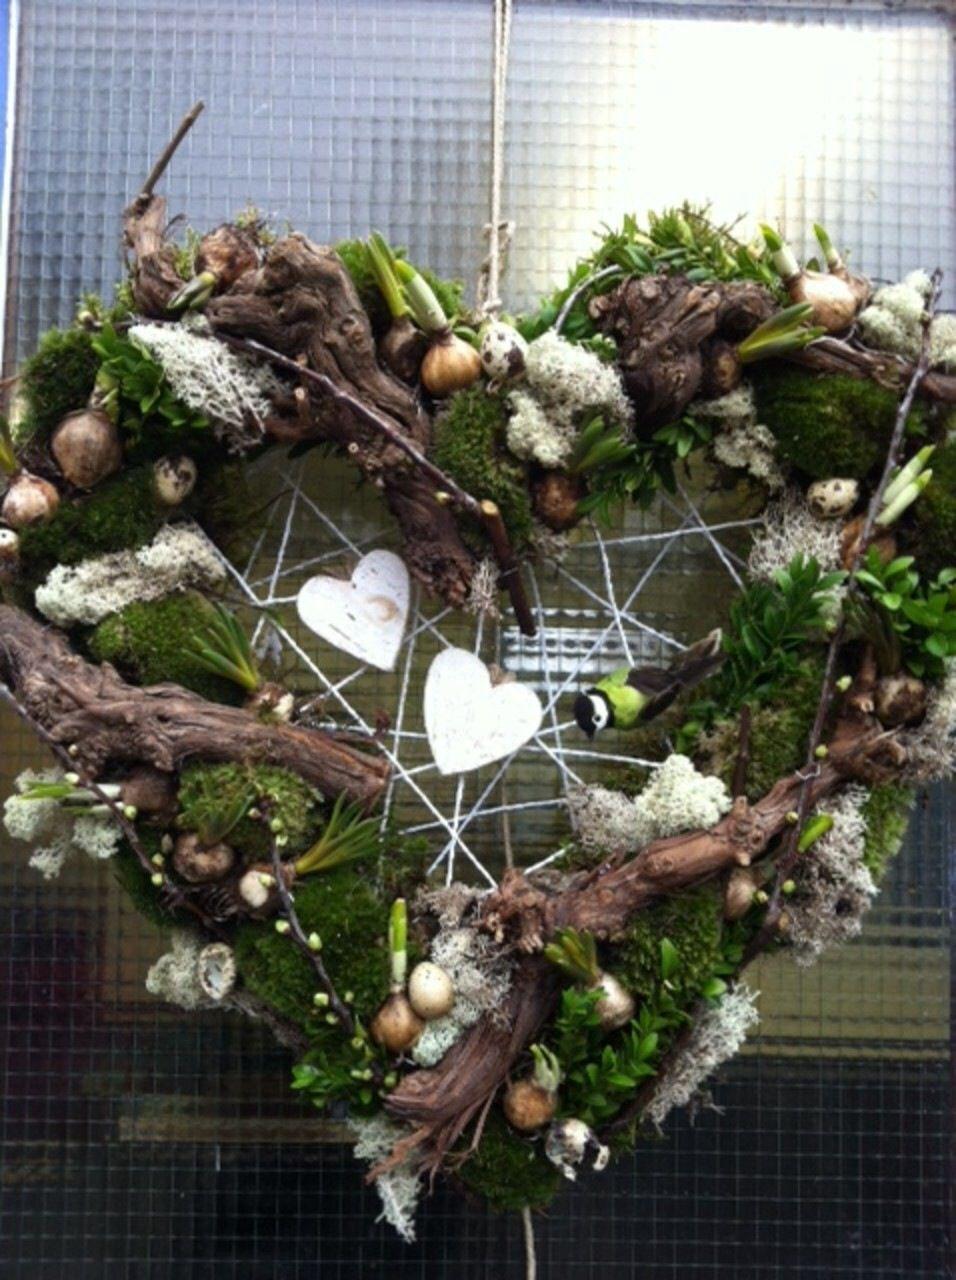 Outside fall wedding decorations february 2019 telle duq rosenoire on Pinterest